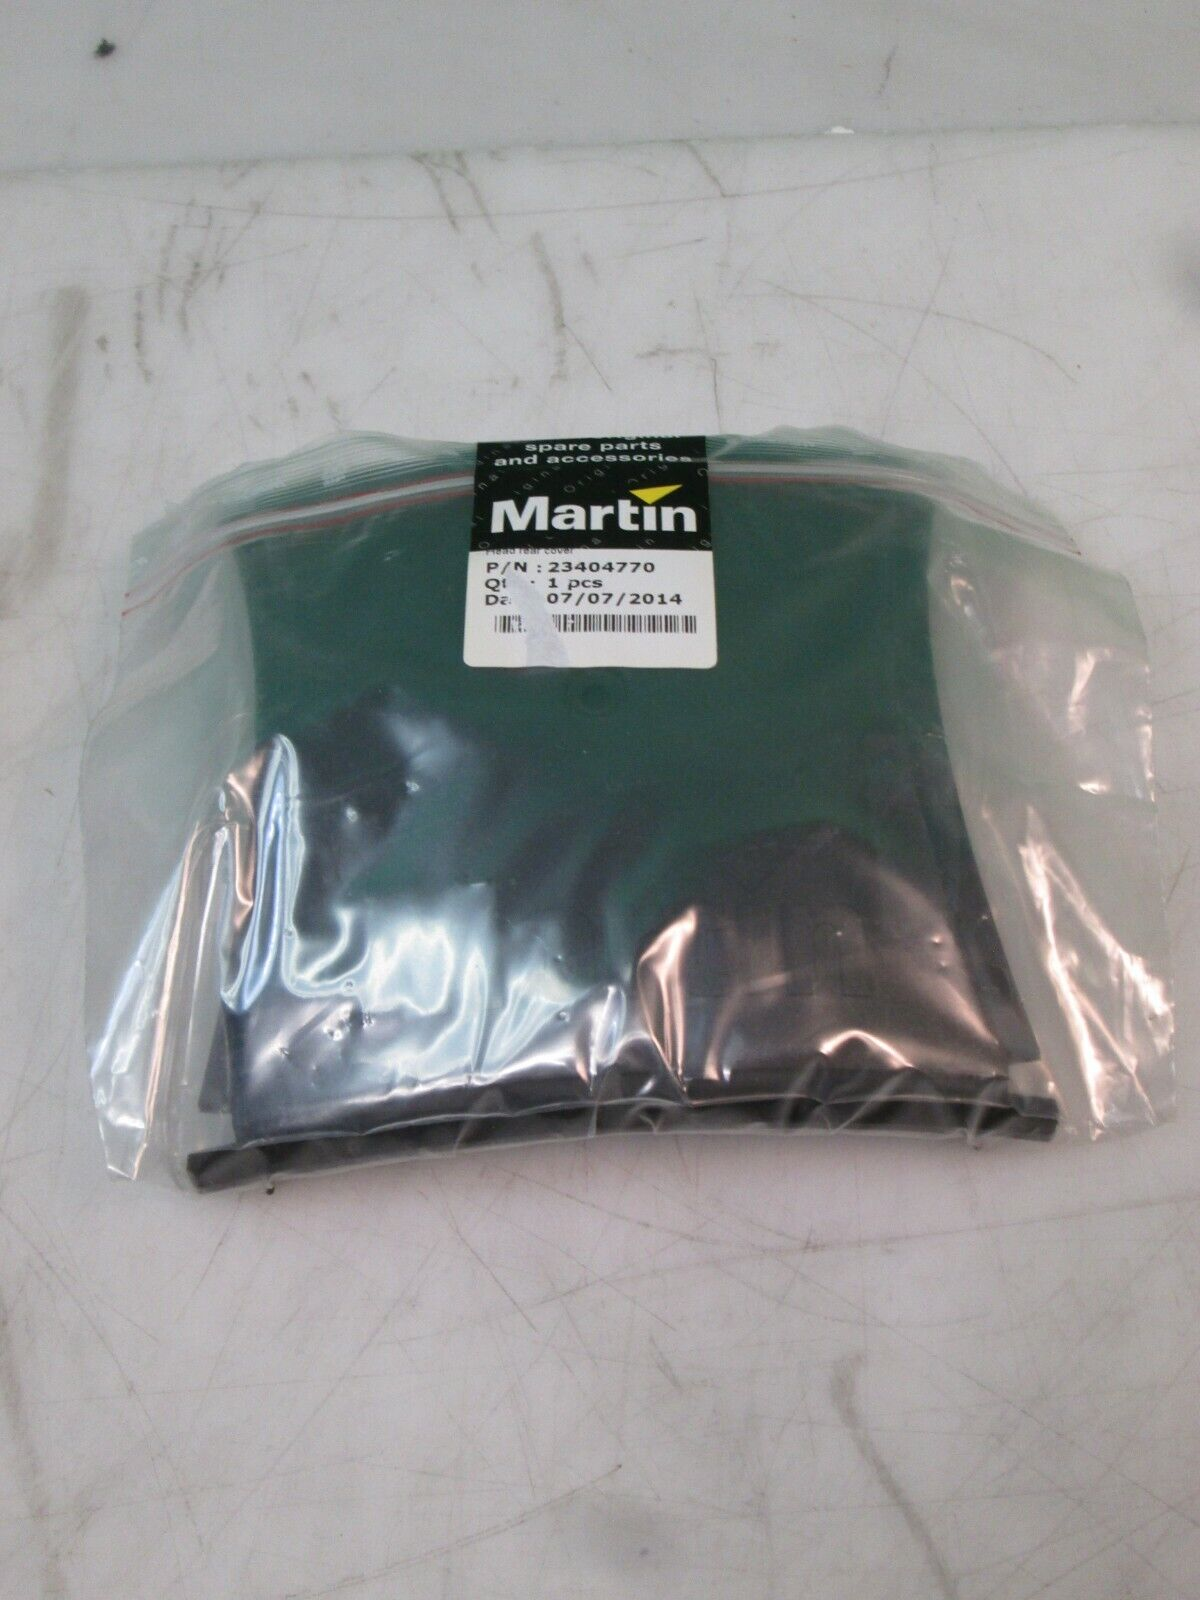 Martin 23404770 Mac Quantum Wash Hear Rear Cover NEW FREE FAST SHIPPING